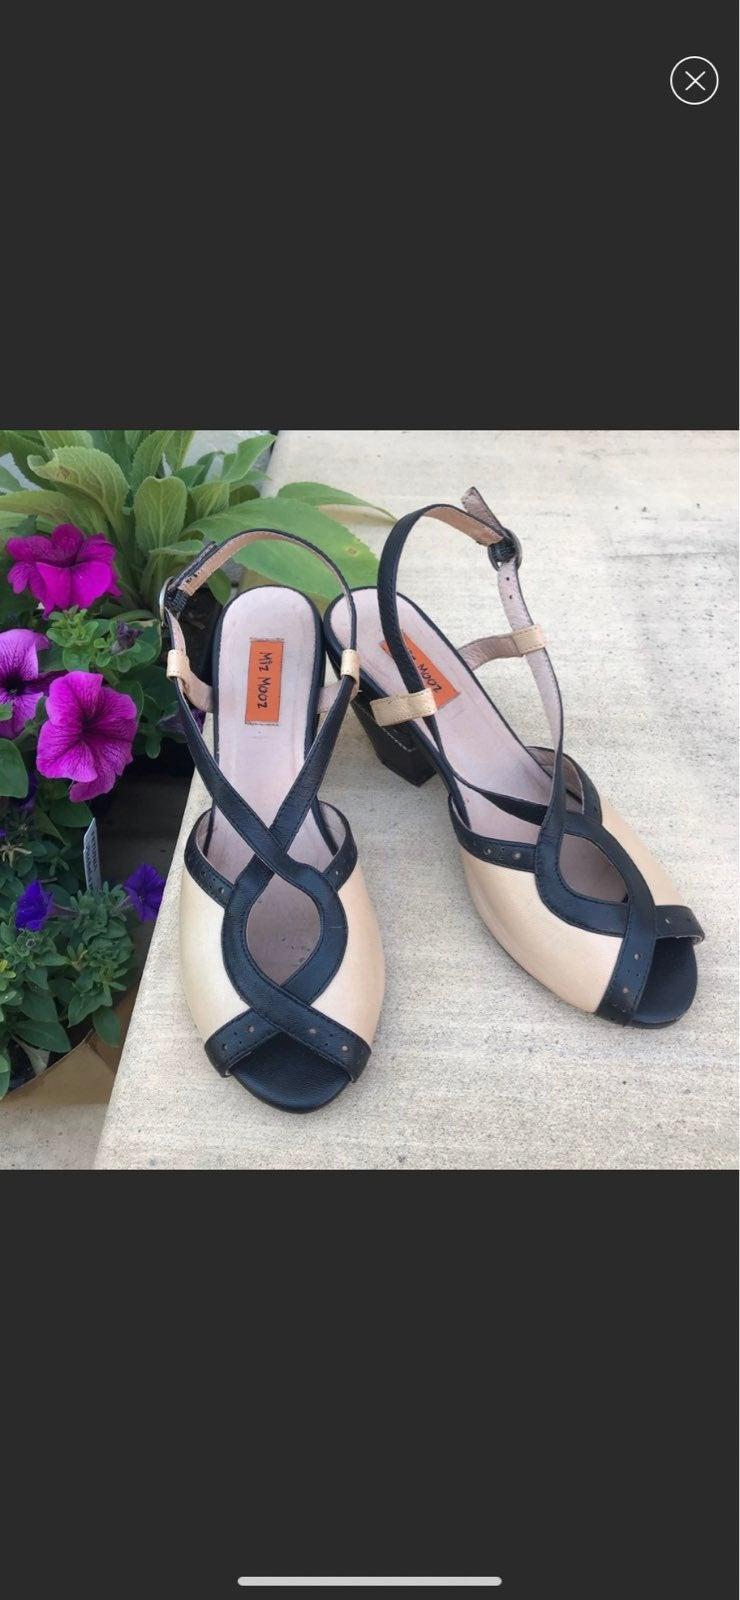 Miz Mooz Pepper heeled sandals 7